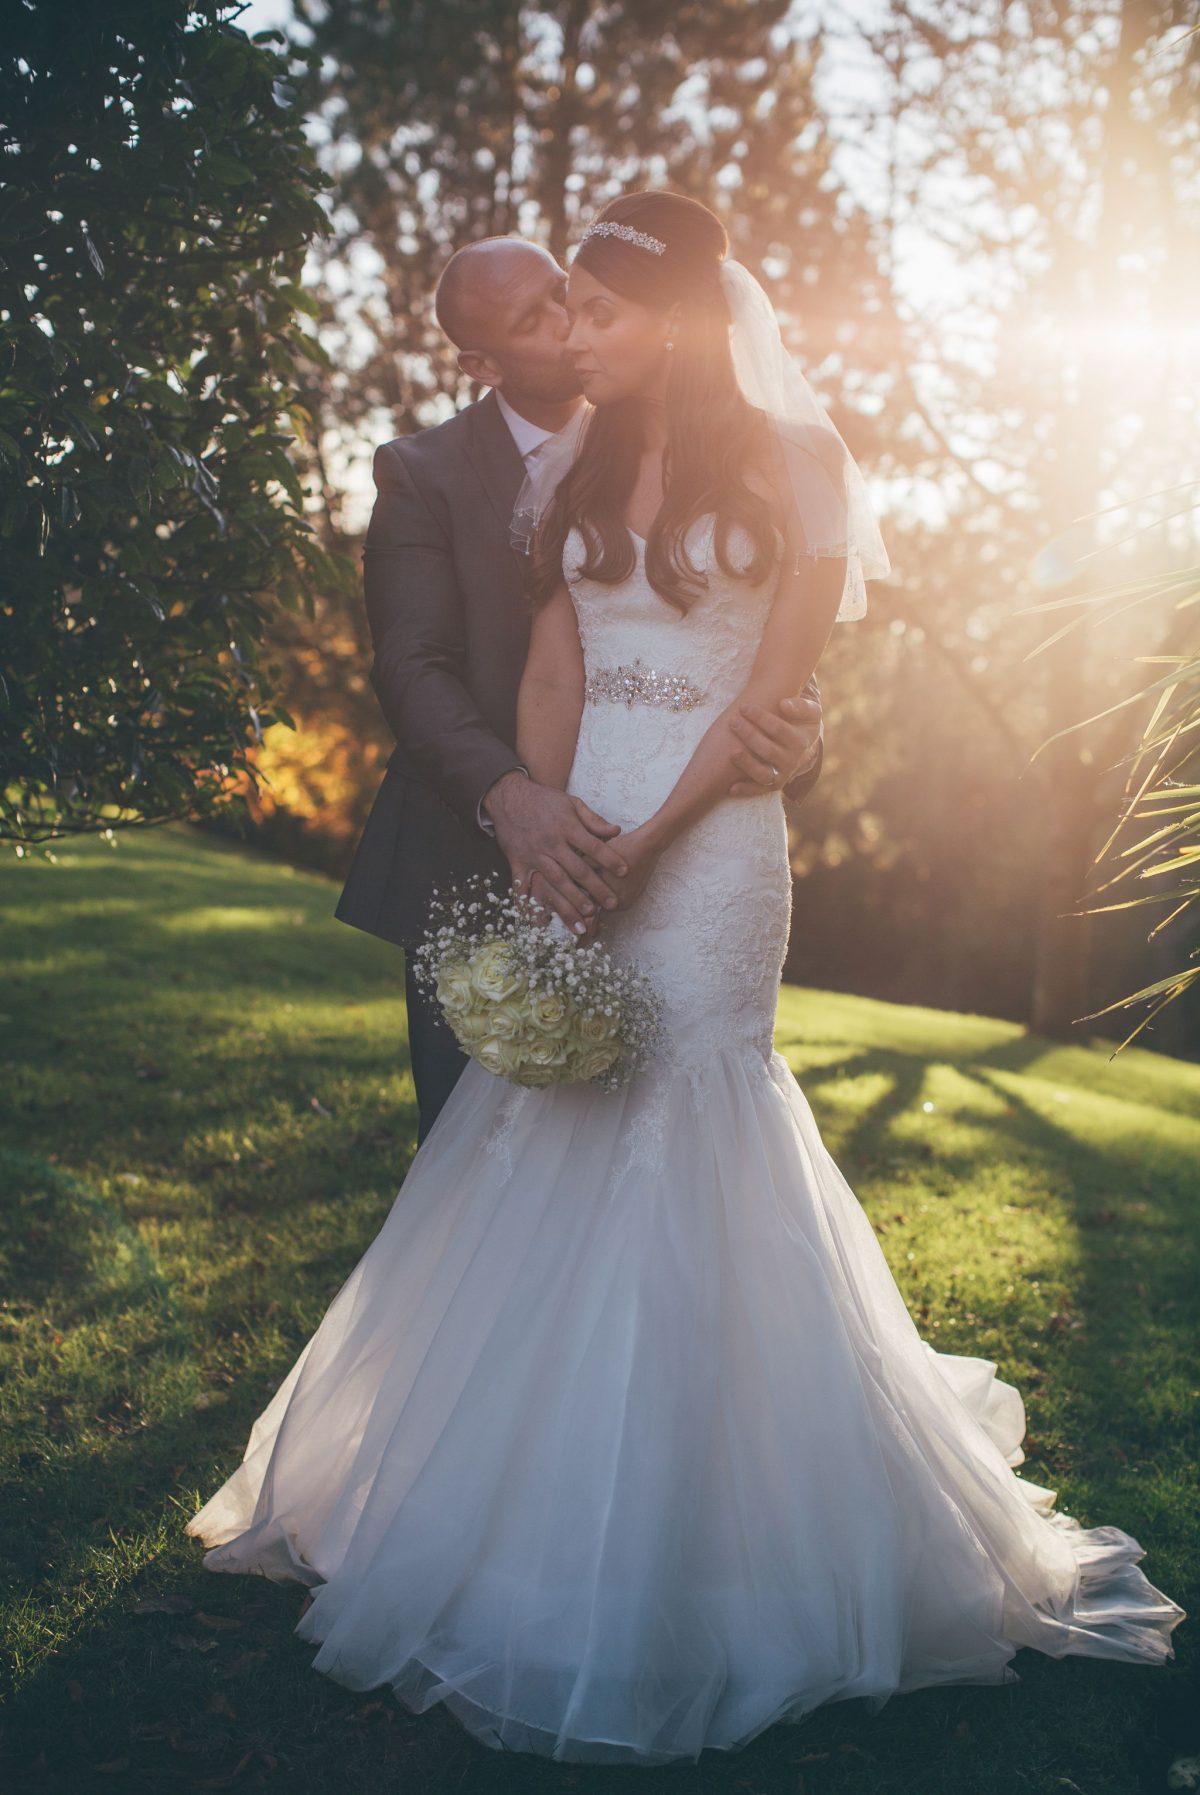 welsh_wedding_photographer_rachel_lambert_photography_decourceys_cardiff_rhiannon_gavin_ 56